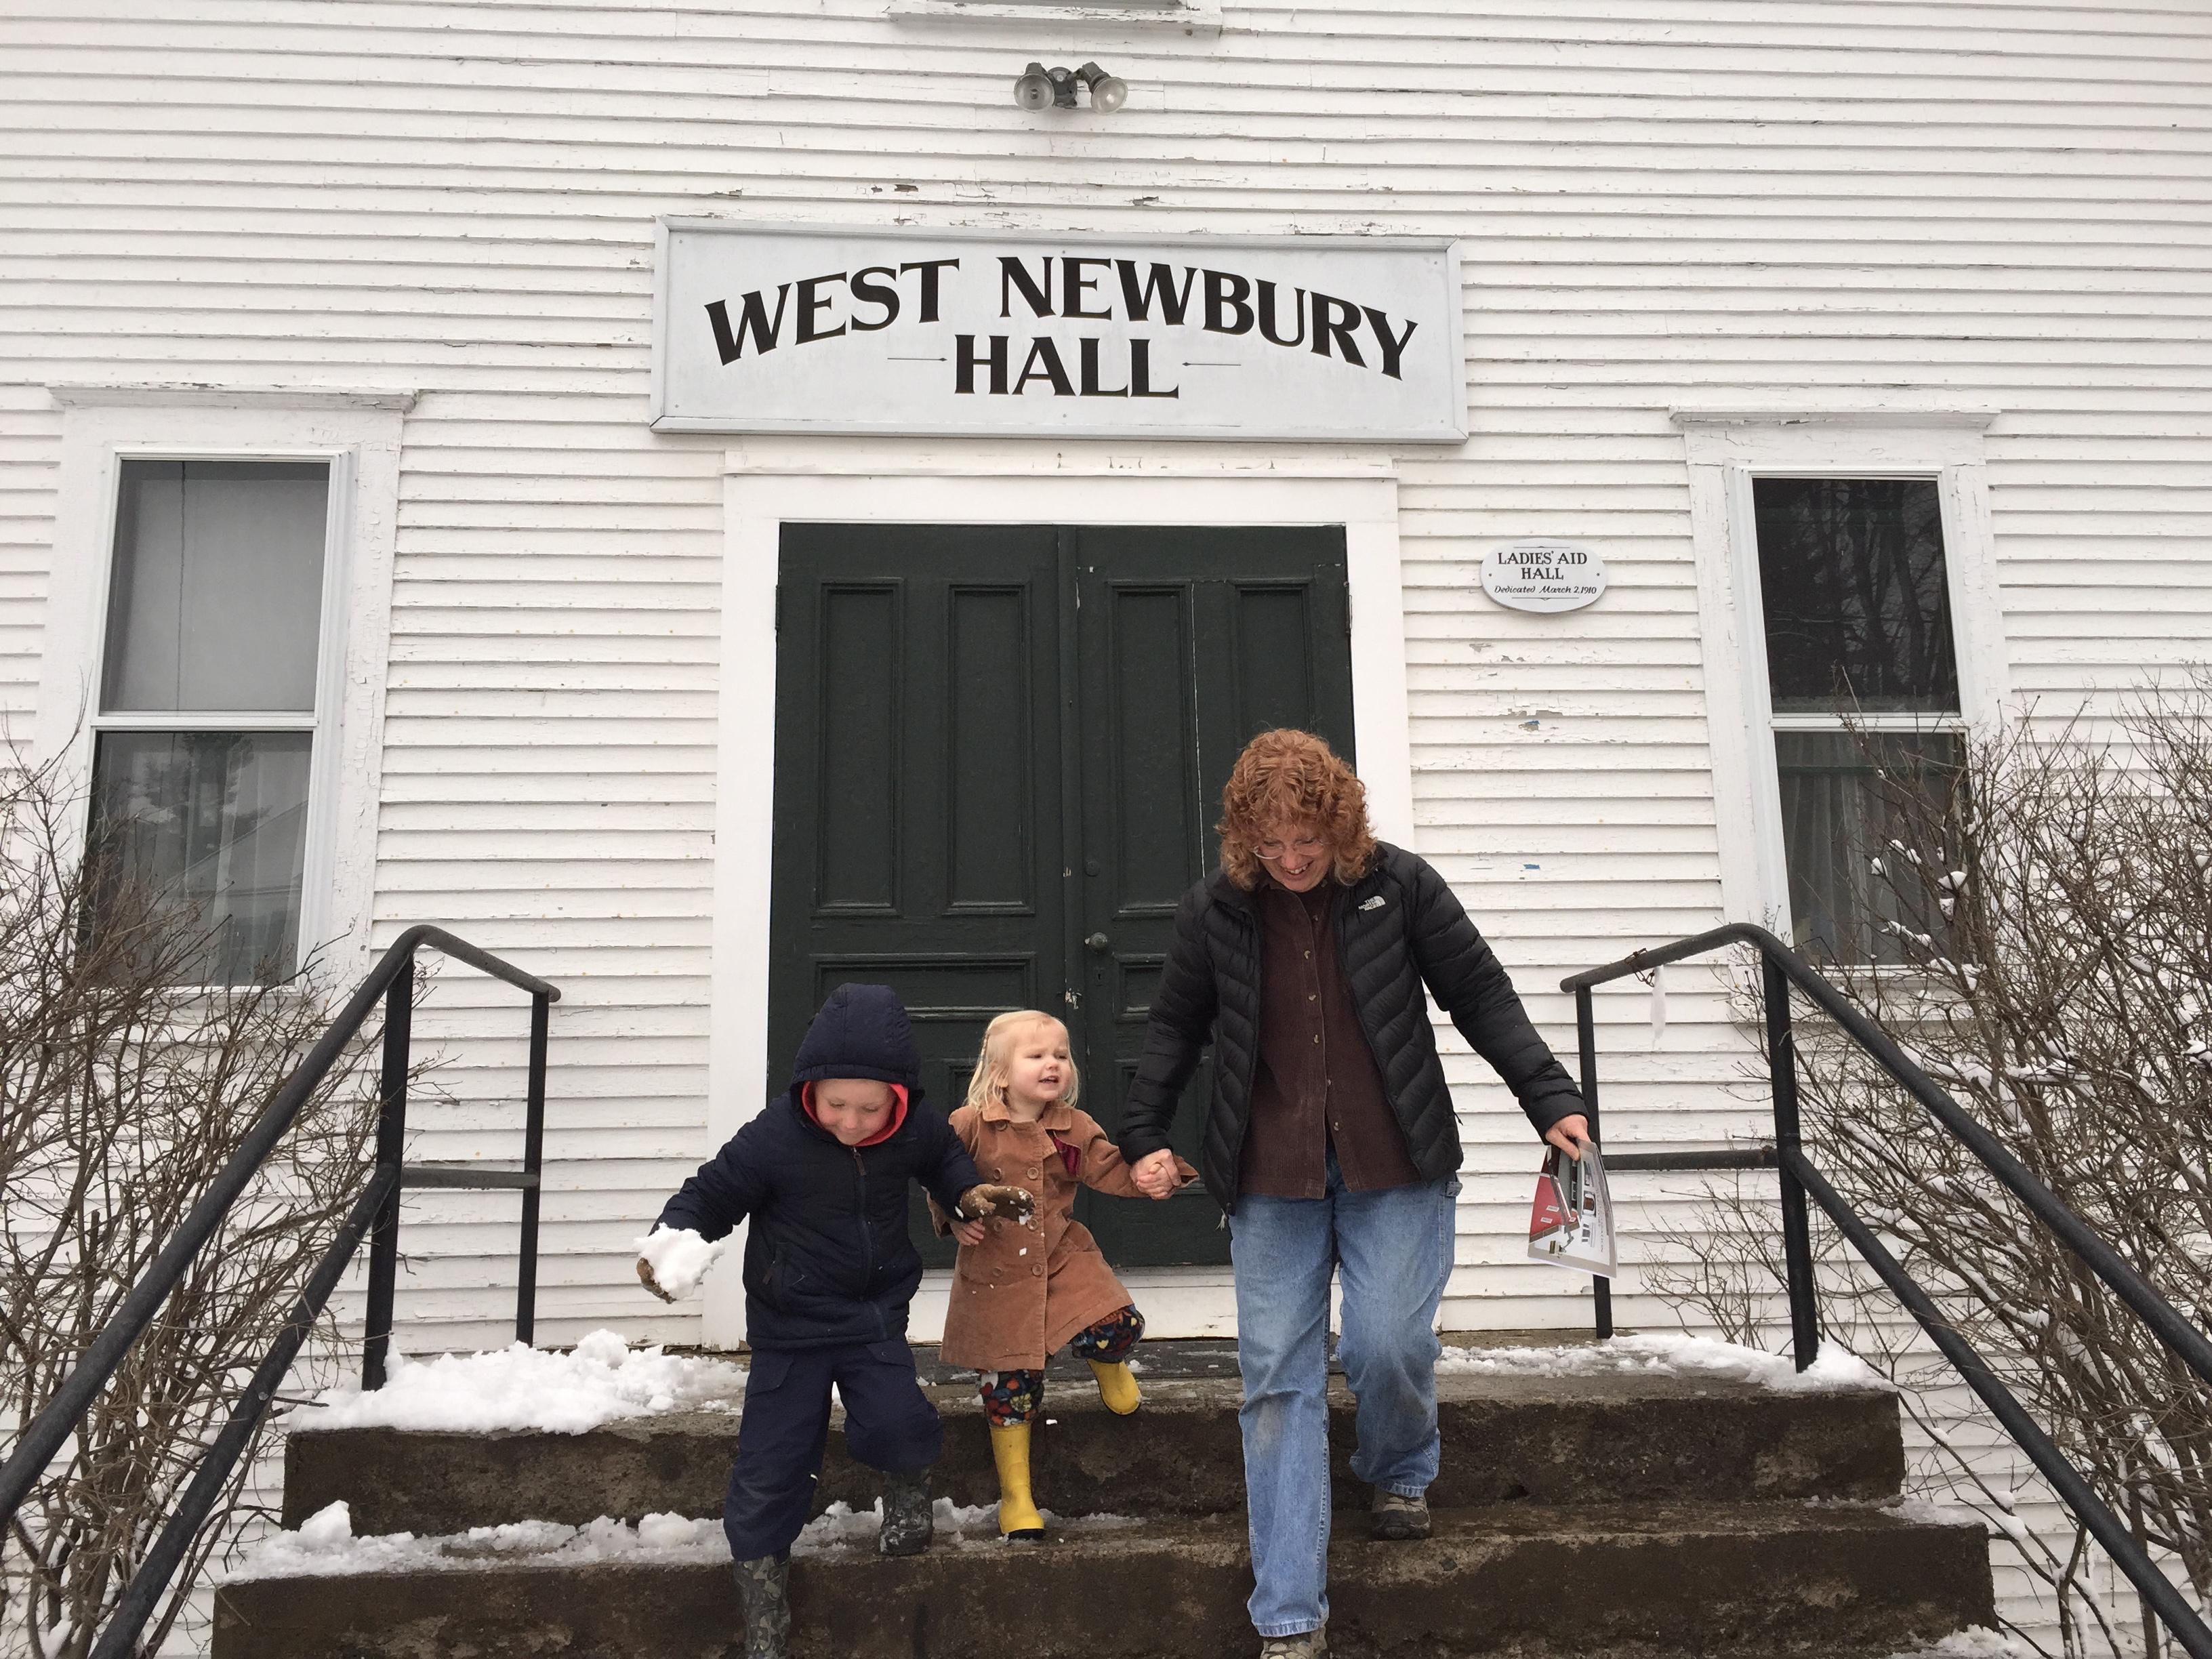 West Newbury Town Hall